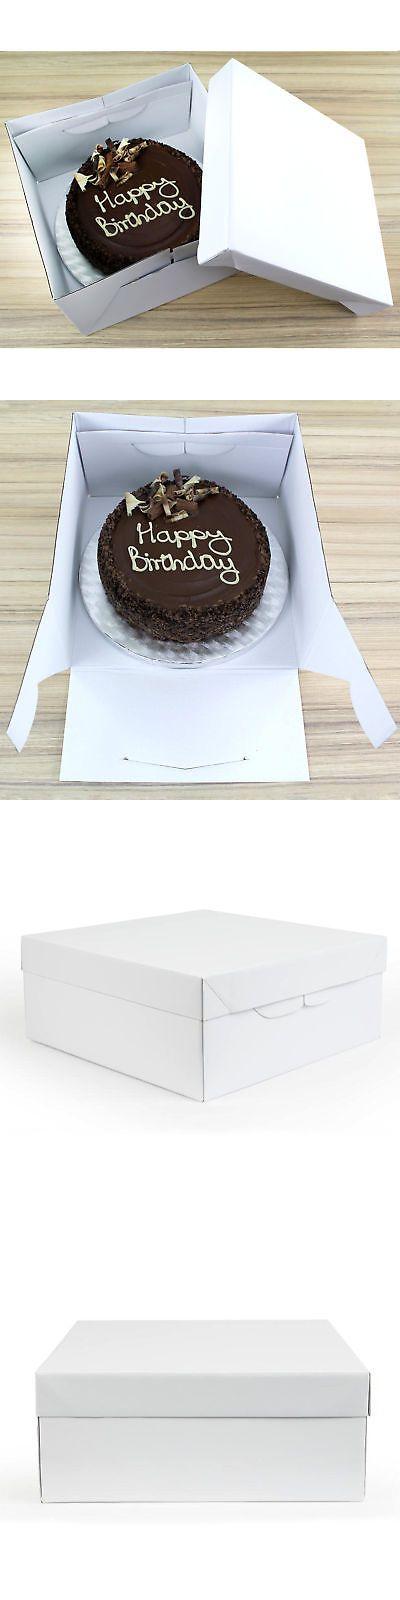 1 Count PME Sugarcraft Cake Box White 10 x 10 x 5-5//8 Inches